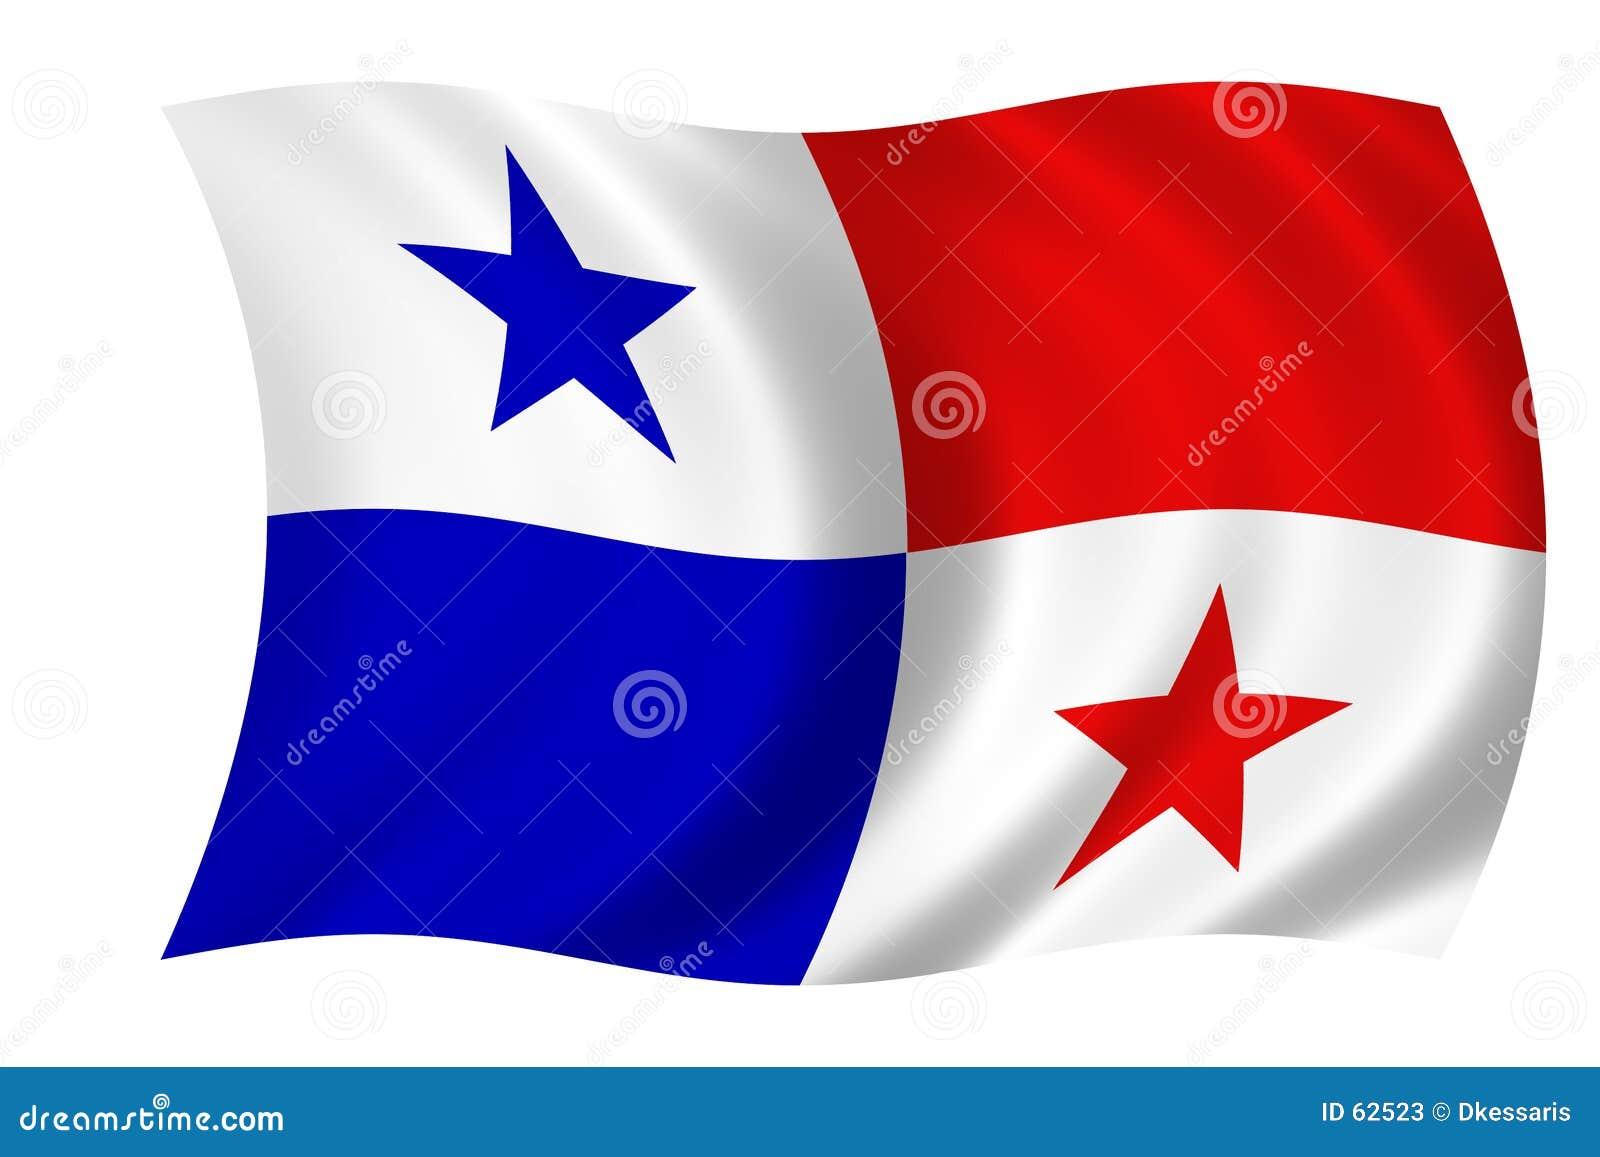 Download Indicateur du Panama illustration stock. Illustration du indicateur - 62523